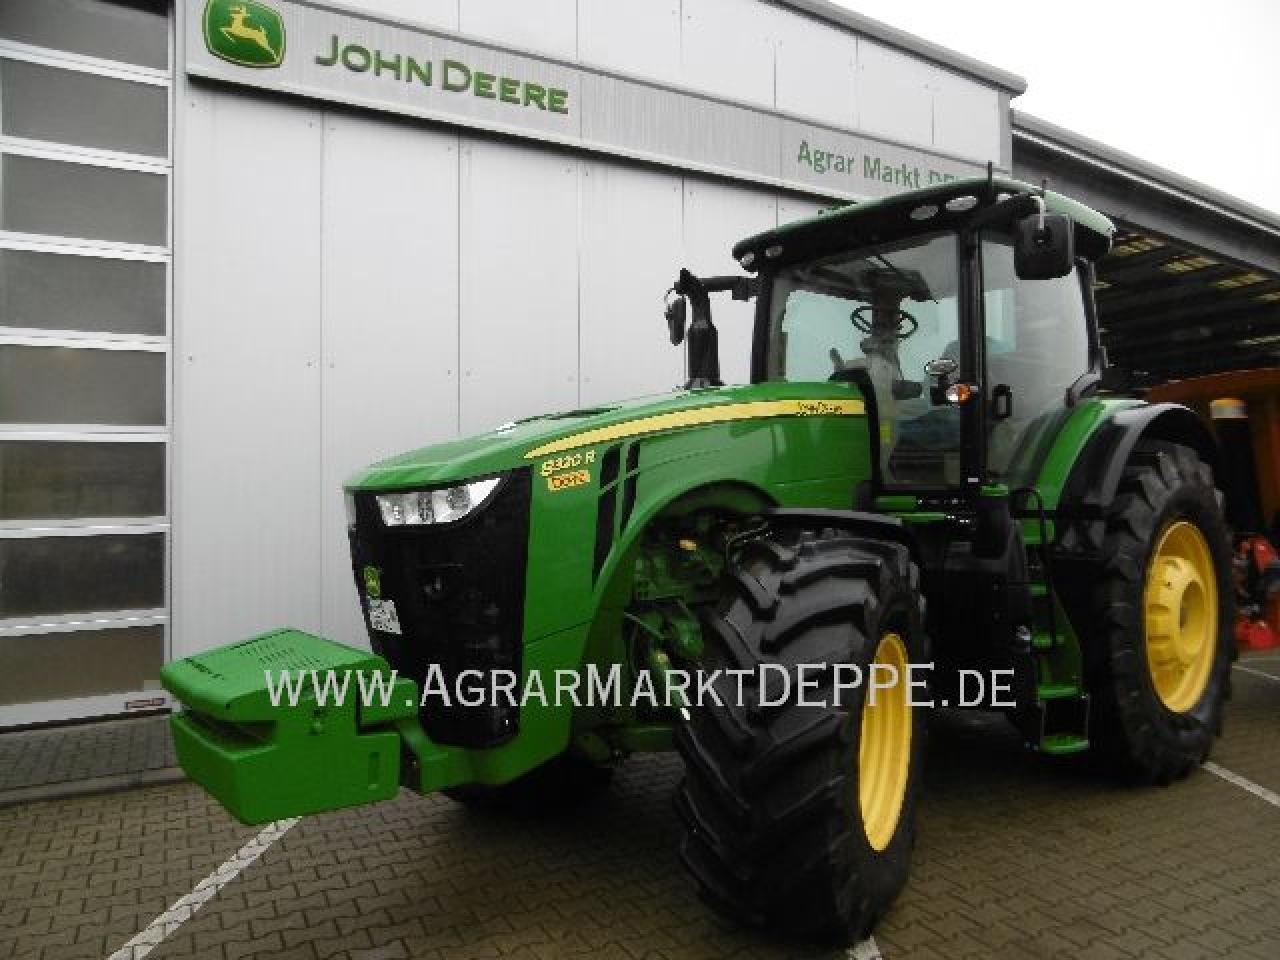 John Deere 8320R AutoTrac